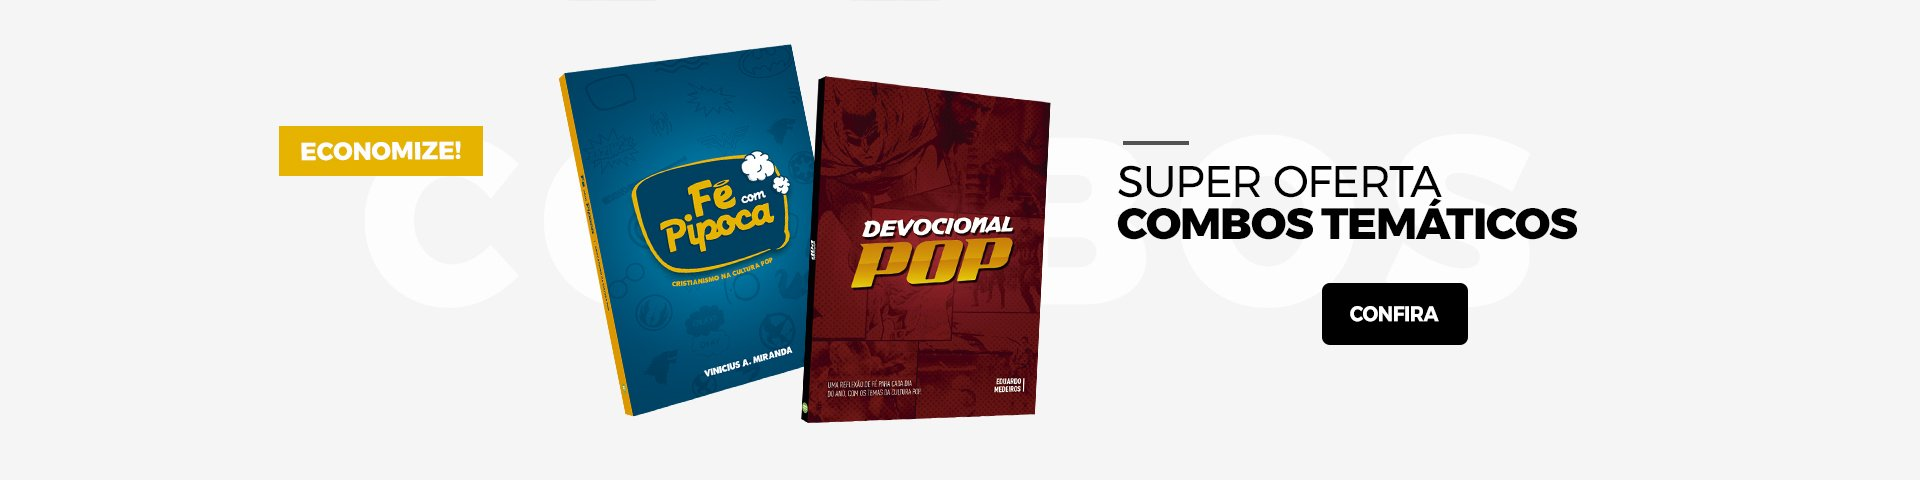 superoferta_combos